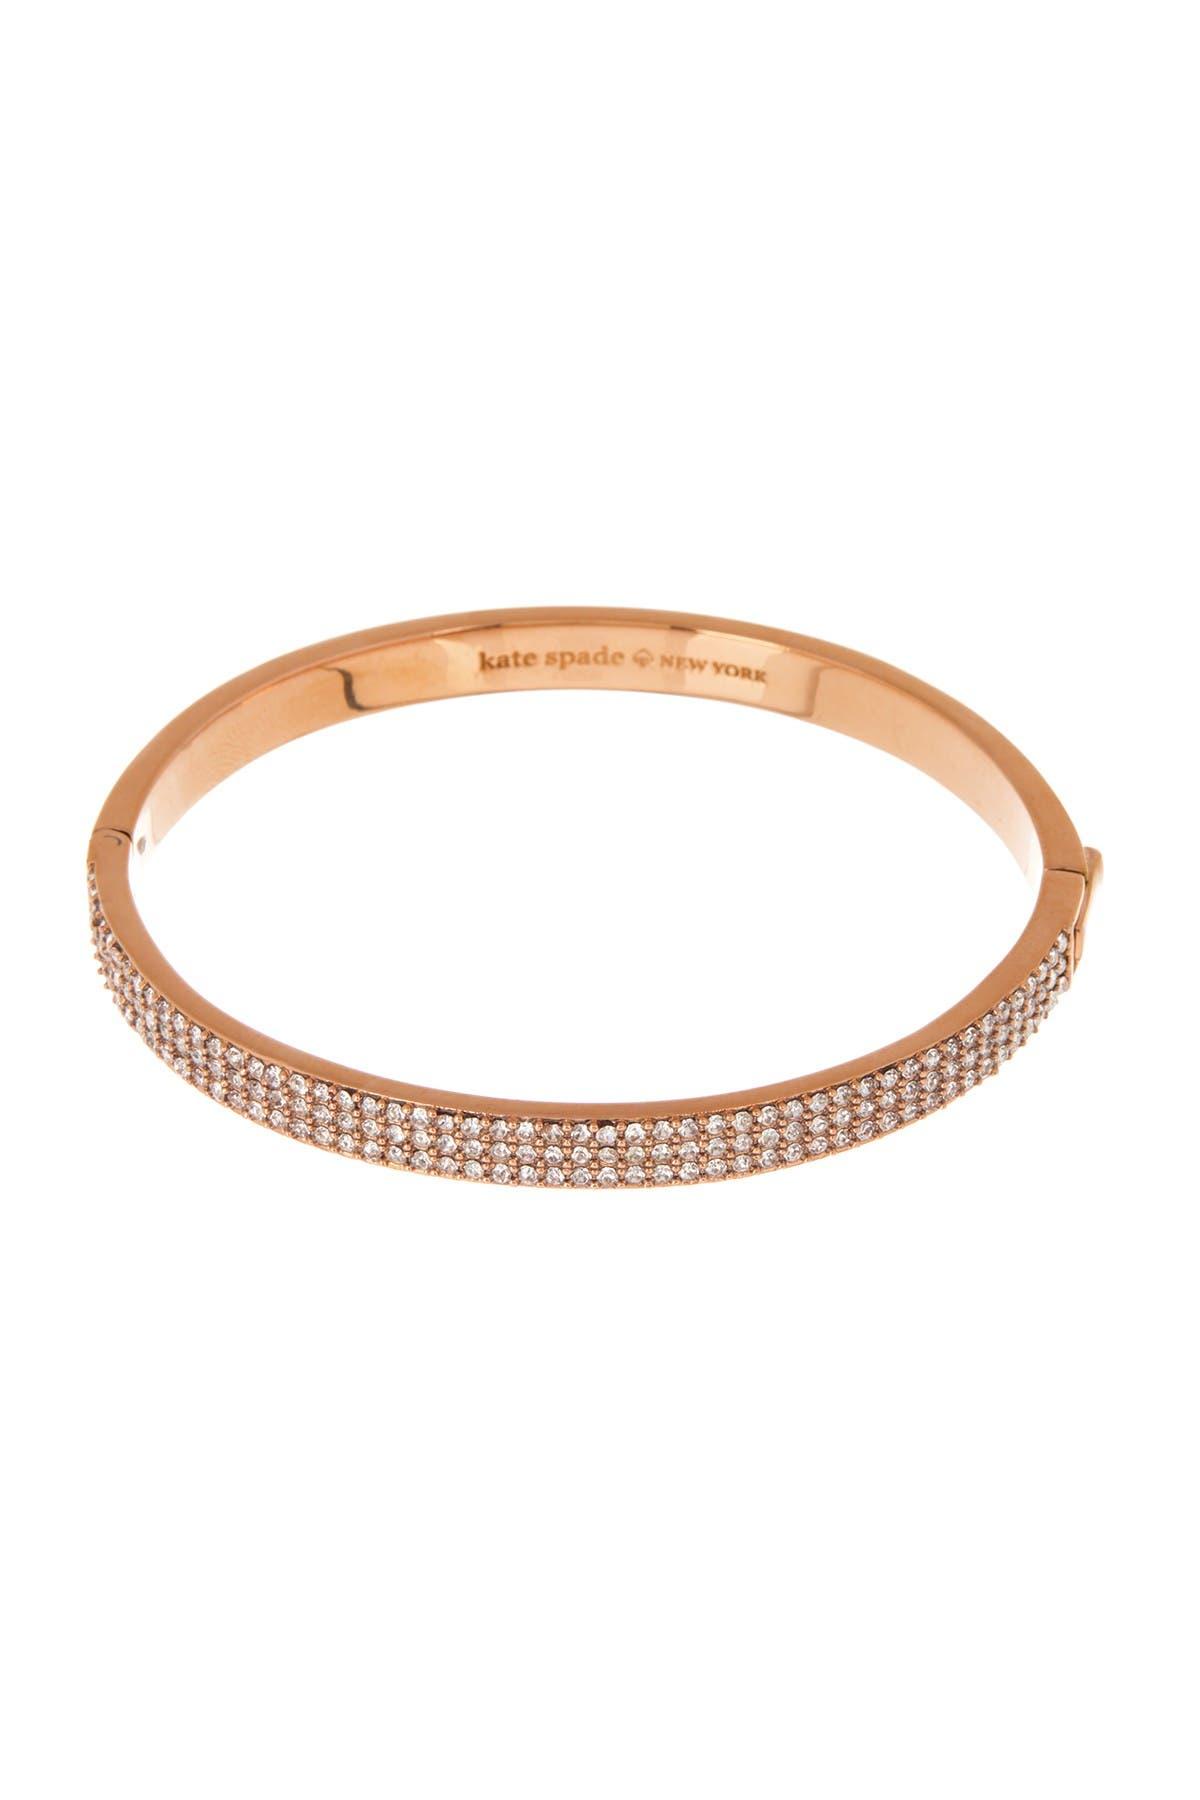 Image of kate spade new york heavy metals pave bangle bracelet